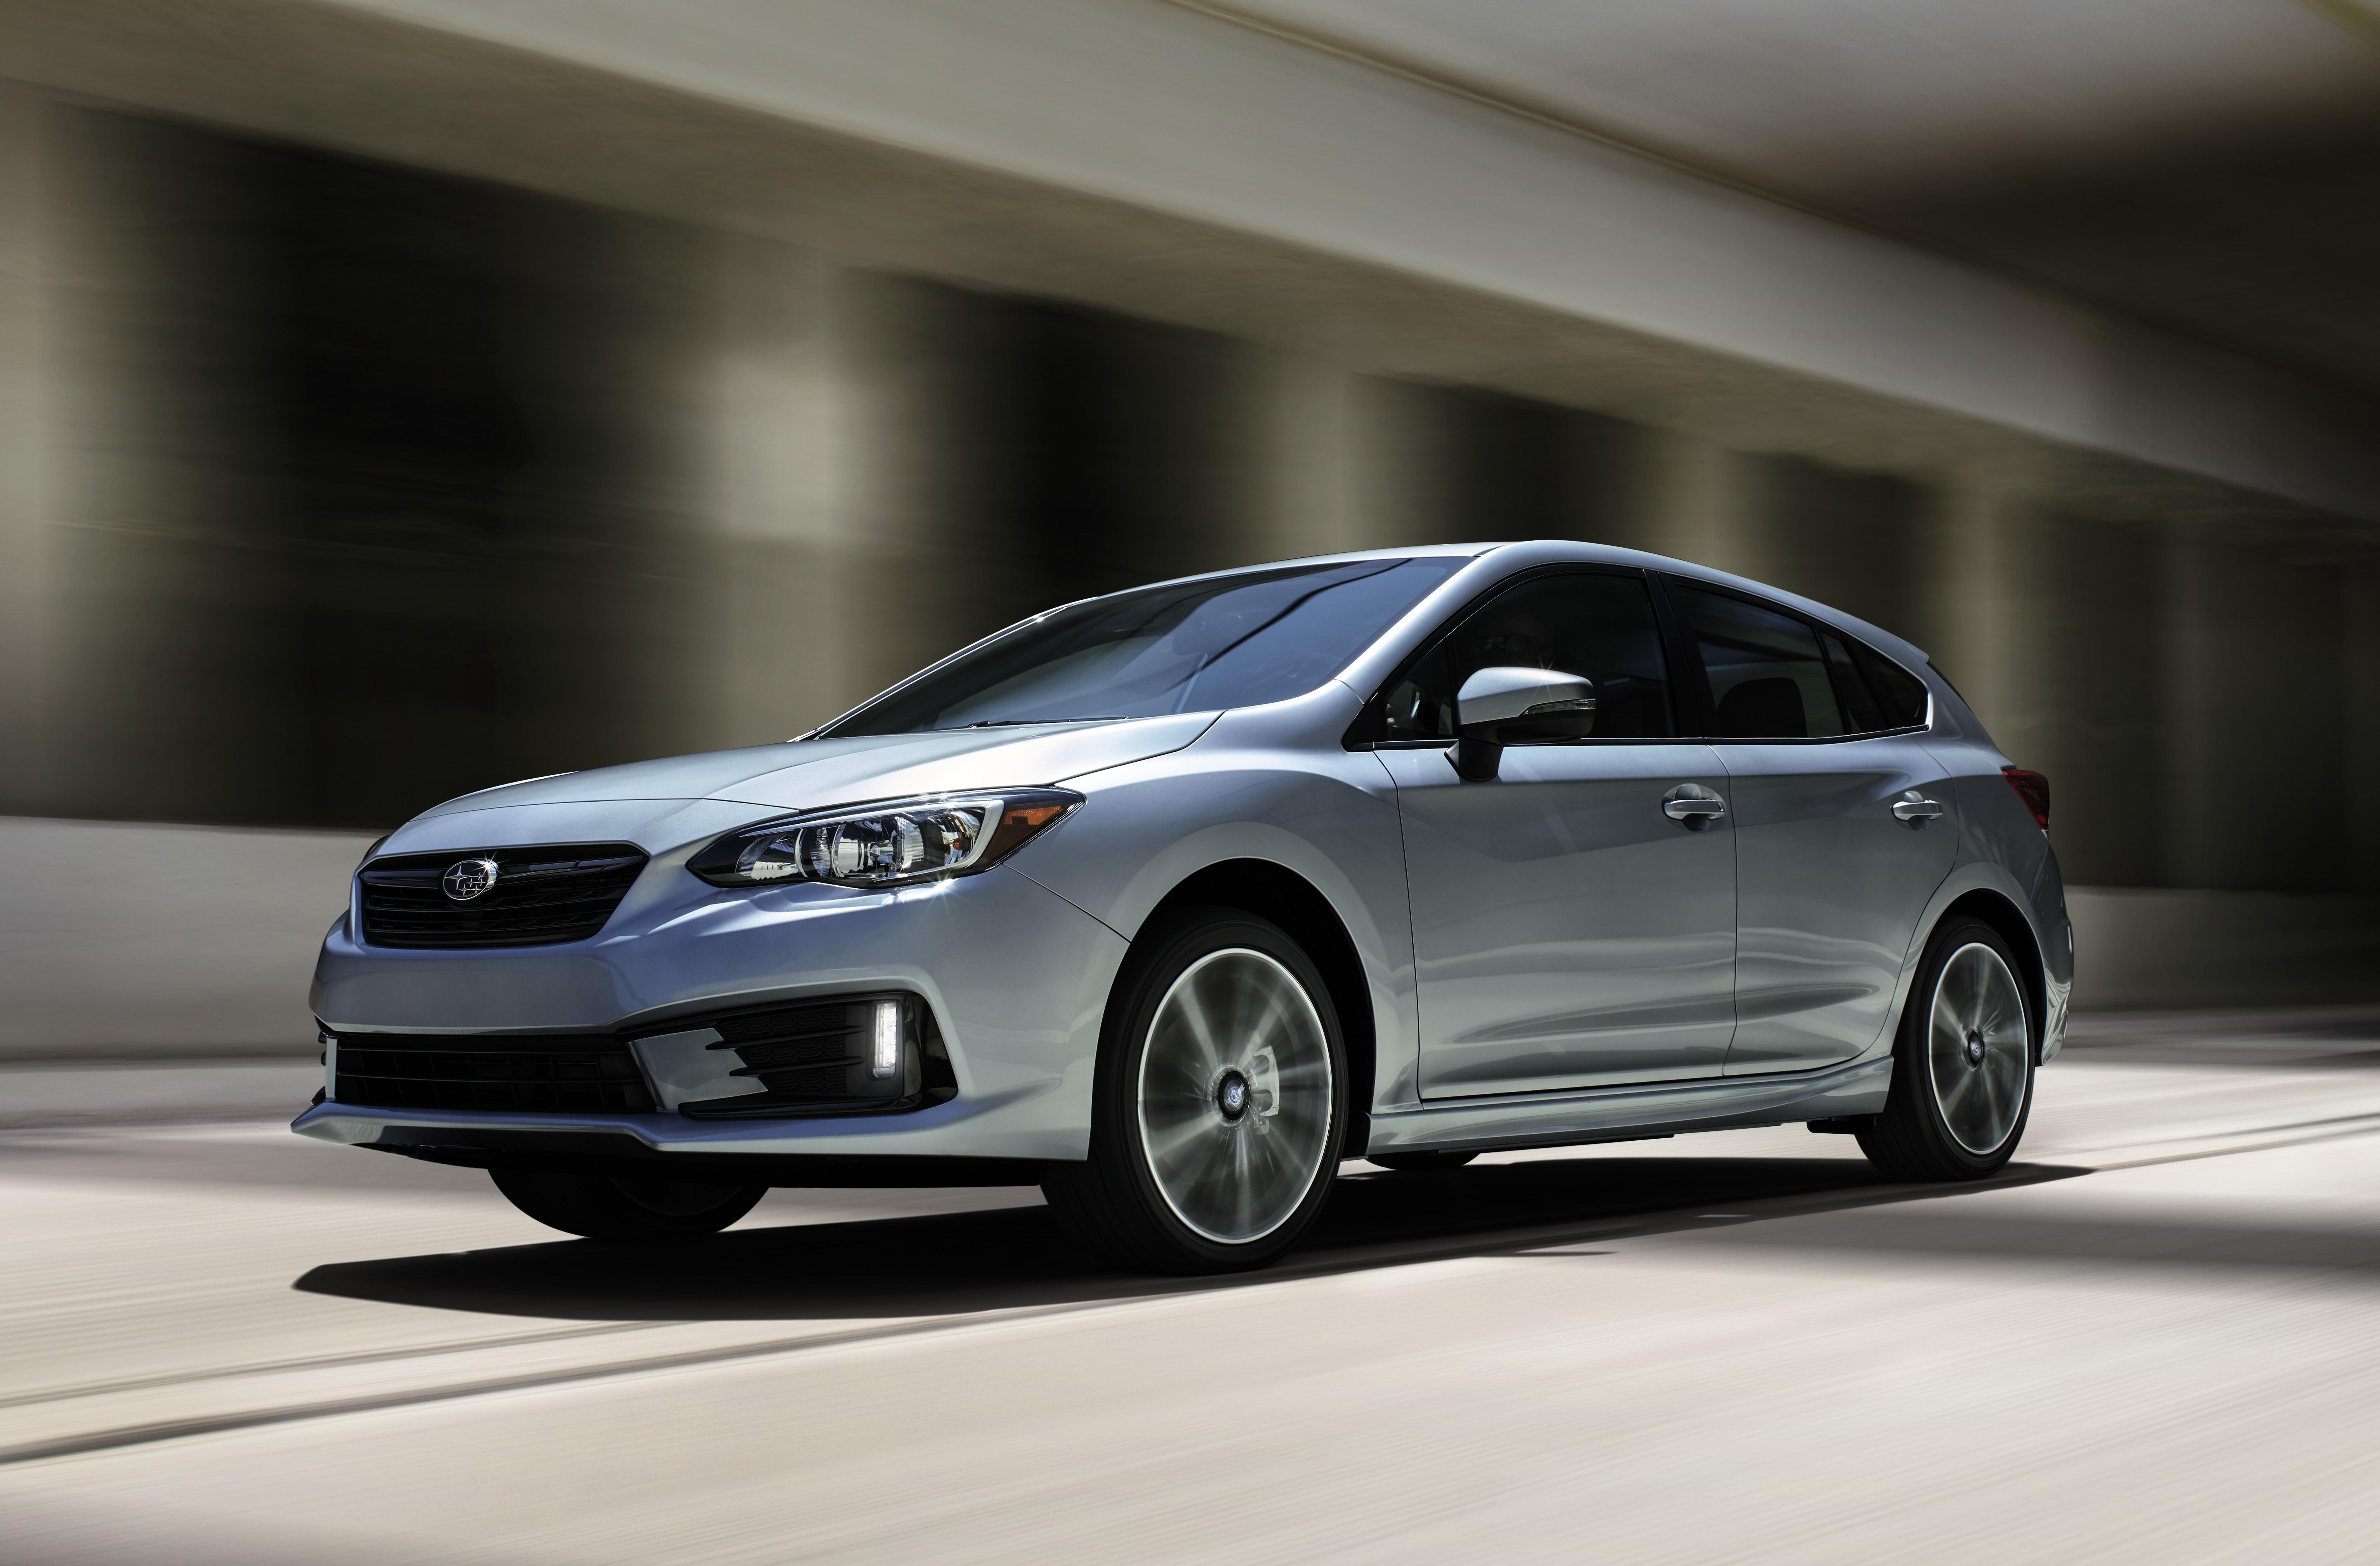 2020 Subaru Impreza Starts at $19,595